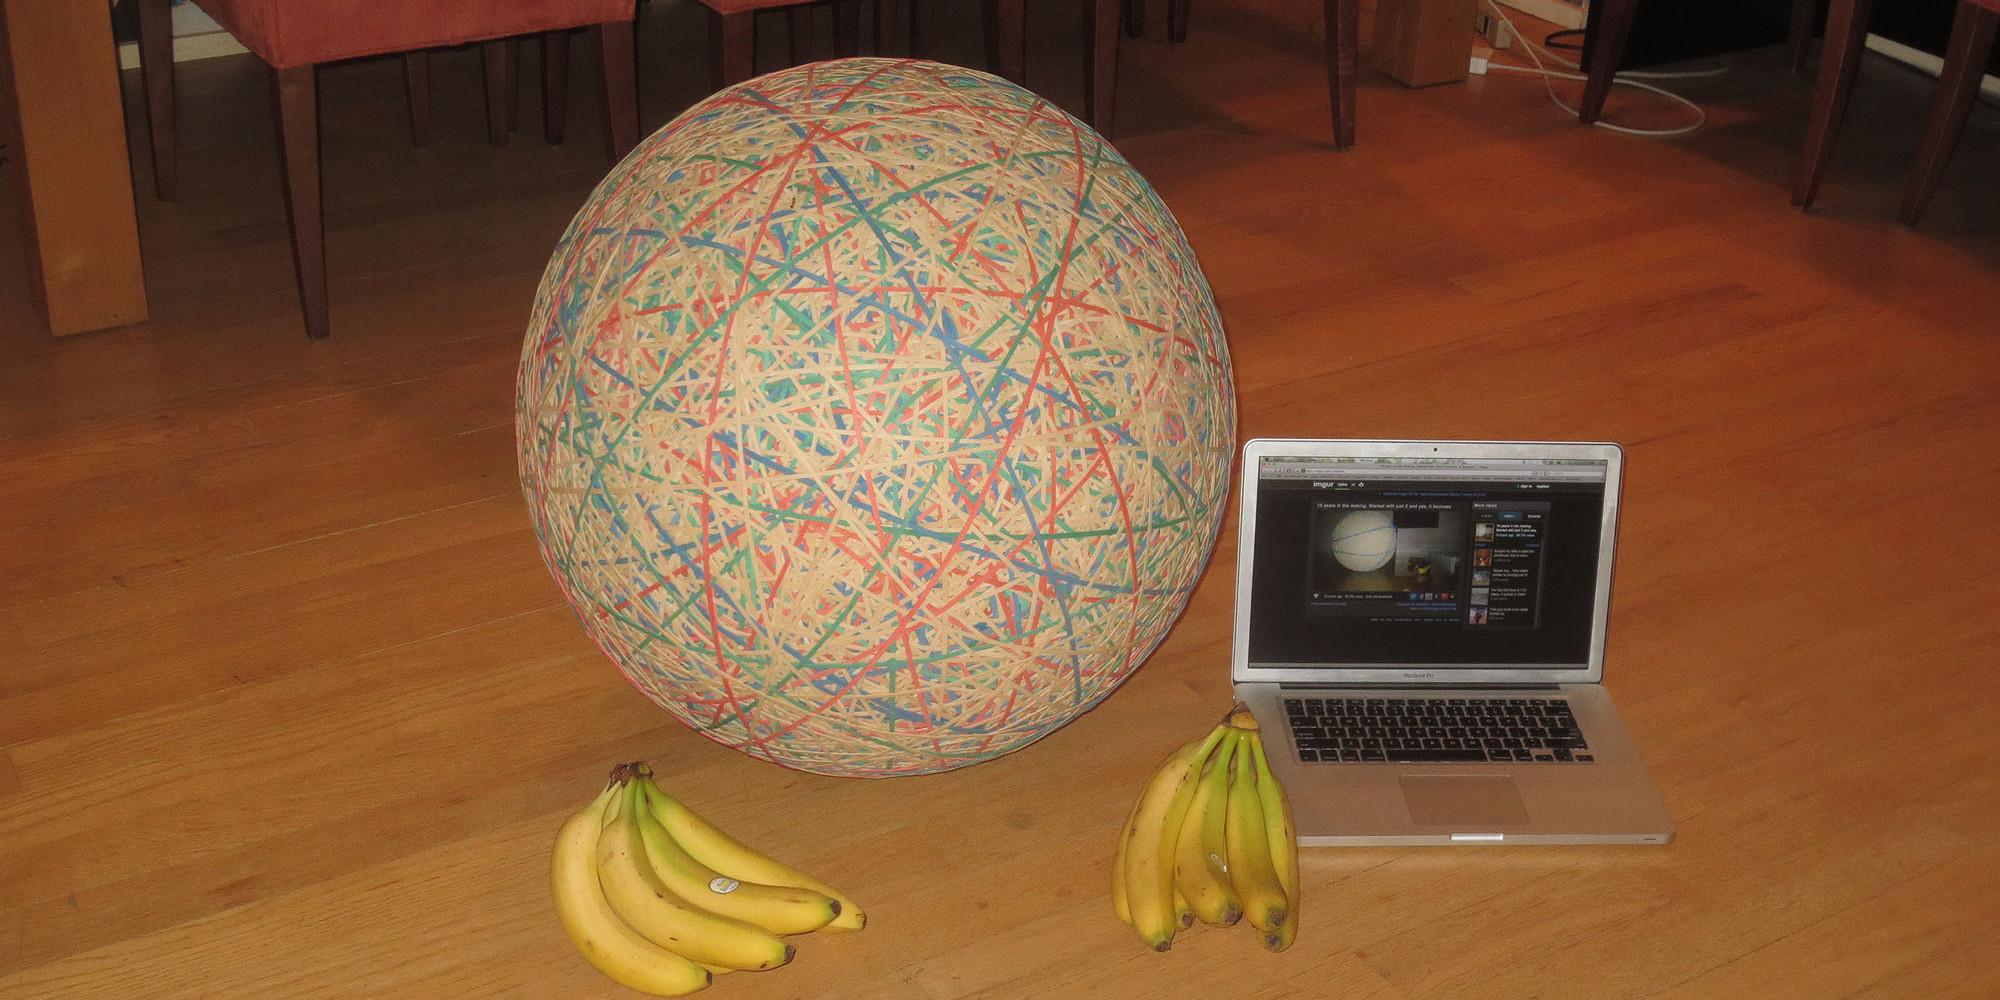 Giant Rubber Ball By Reddit User Zack Hample Took 32